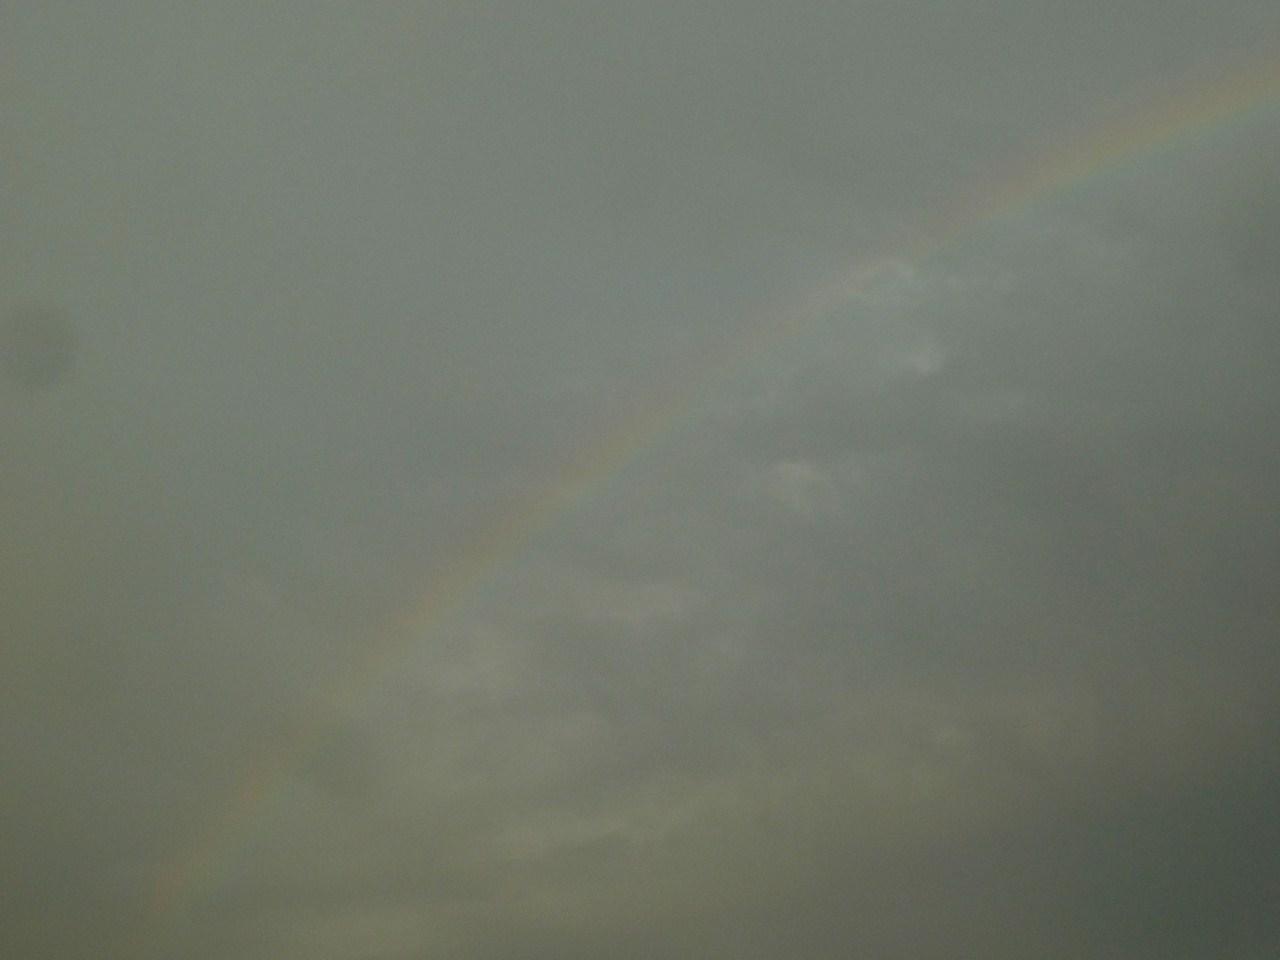 http://www.shintoko.jp/engblog/archives/images/2012/04/120408_rainbowdoha924.jpg